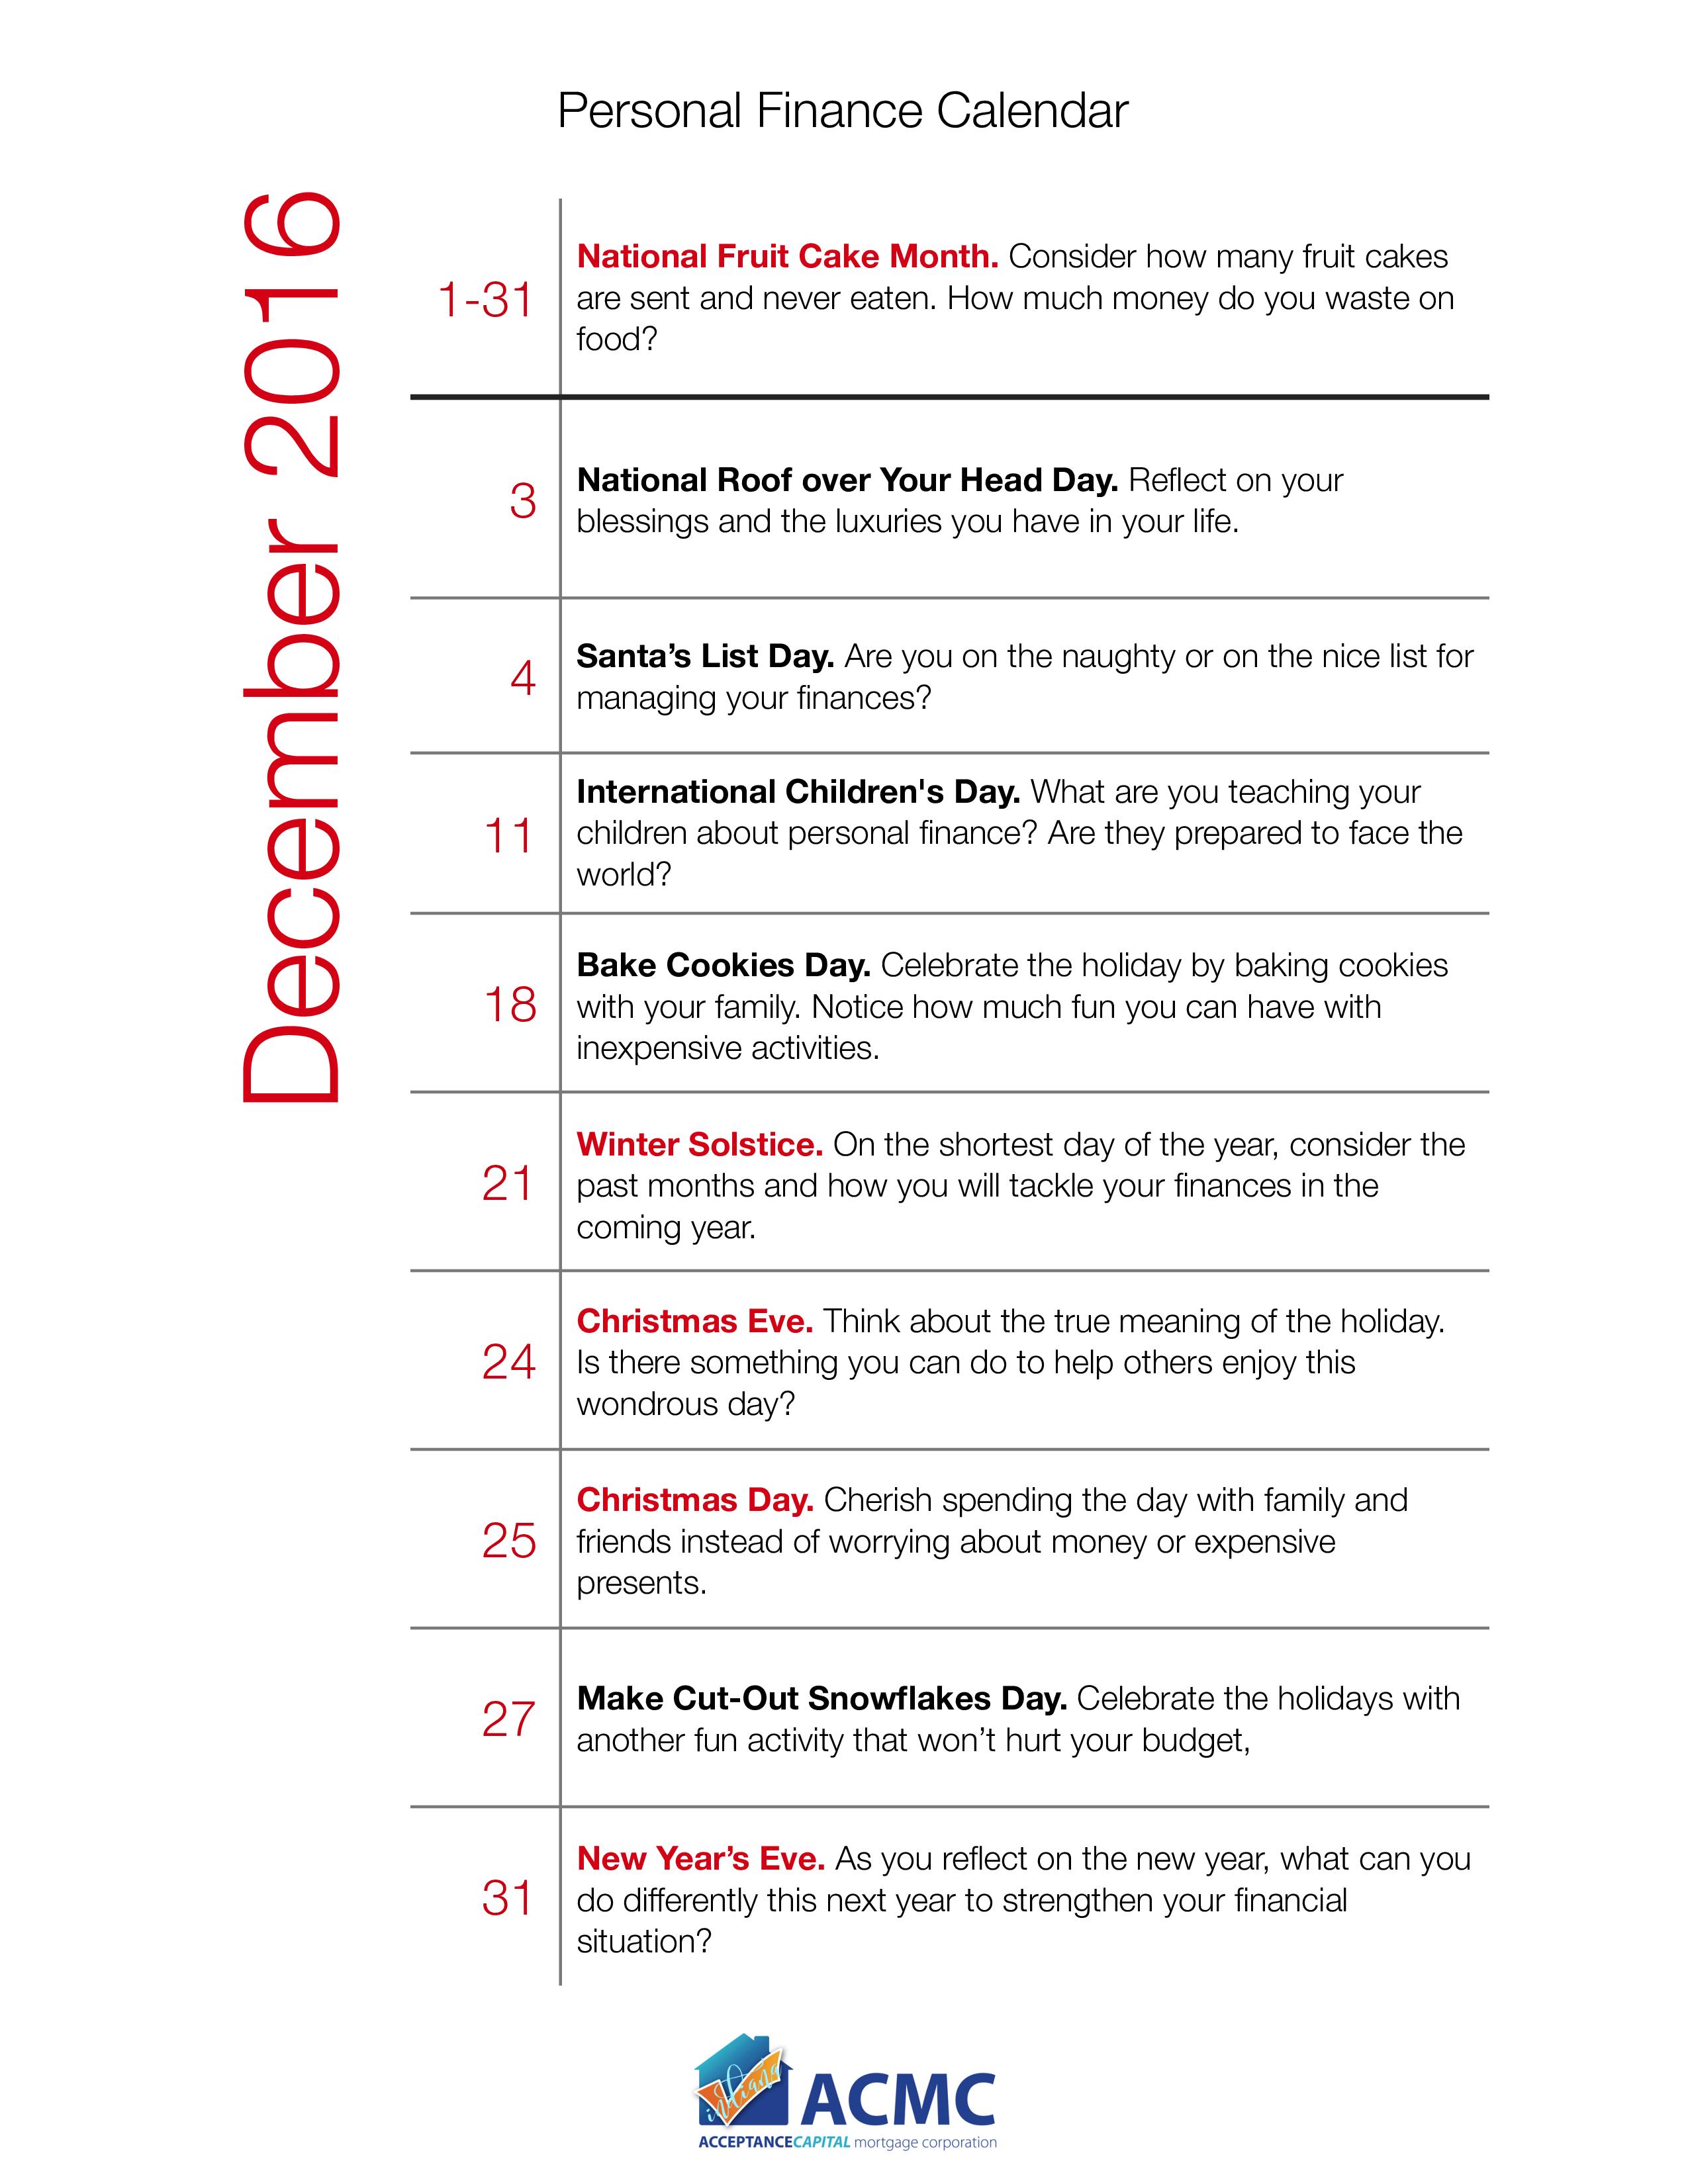 Free Personal Financial Calendar Templates At Allbusinesstemplates